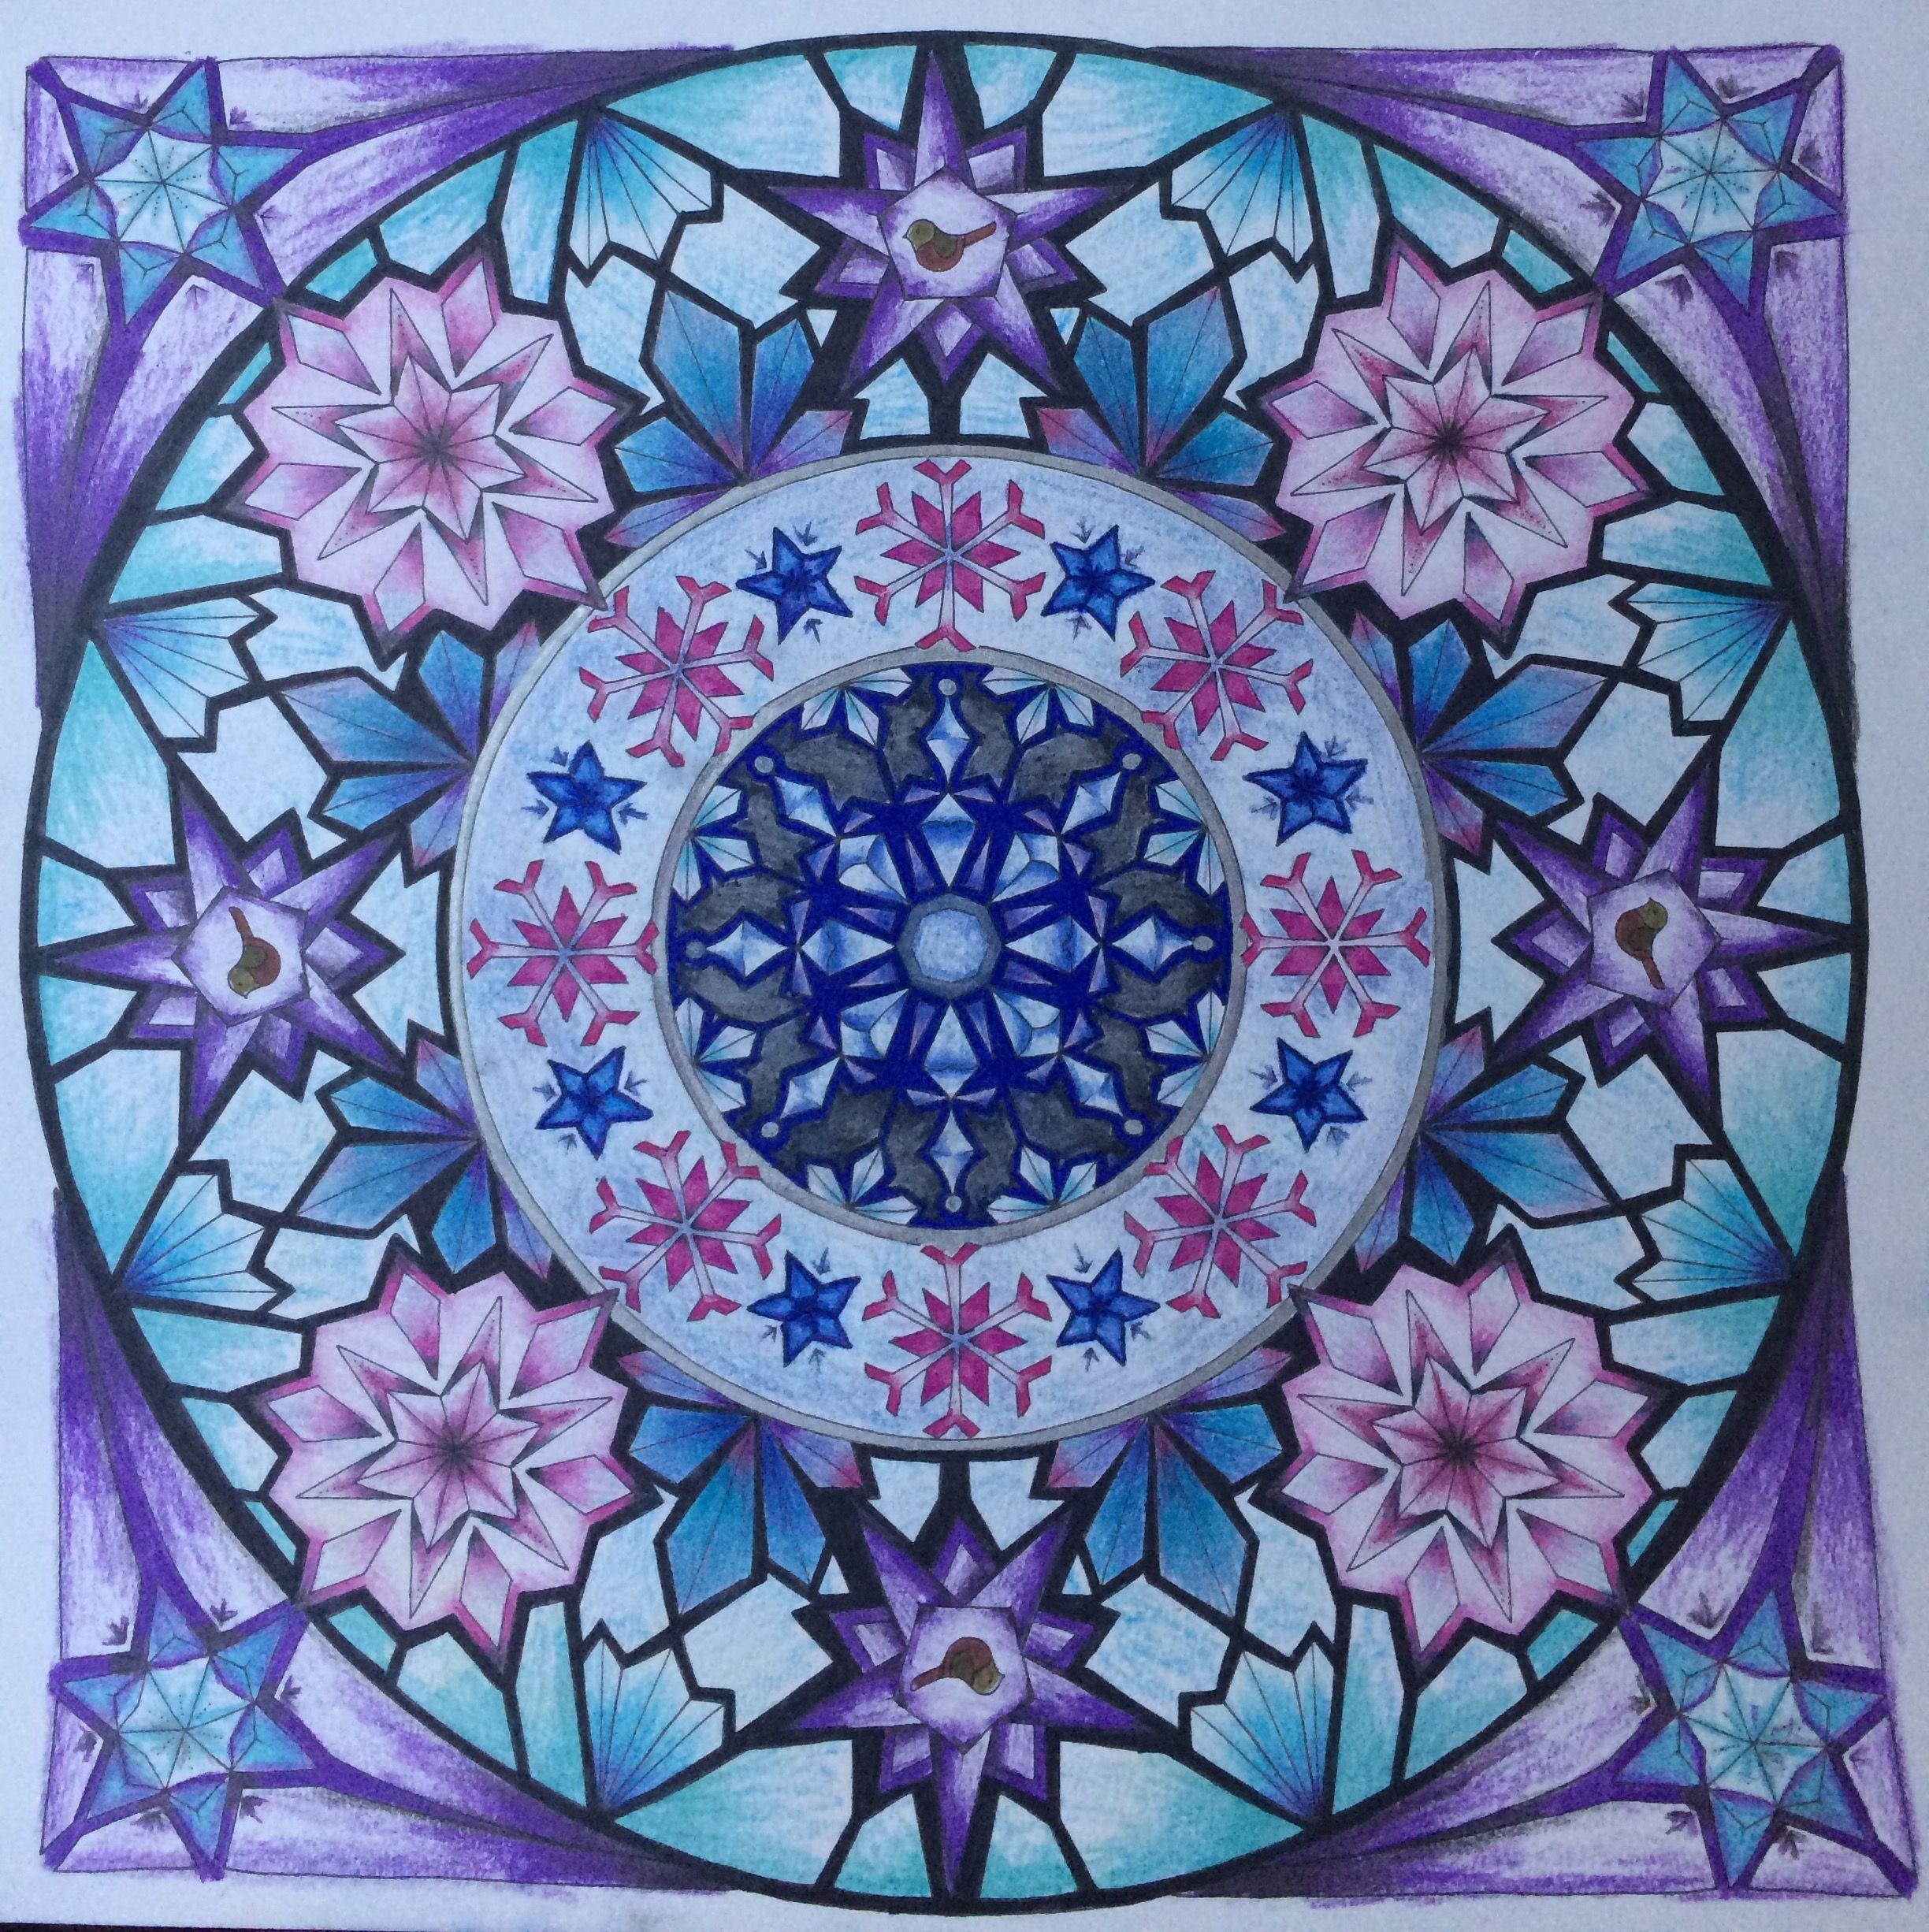 Pin de Anelia Ivanova en Coloring | Mandalas